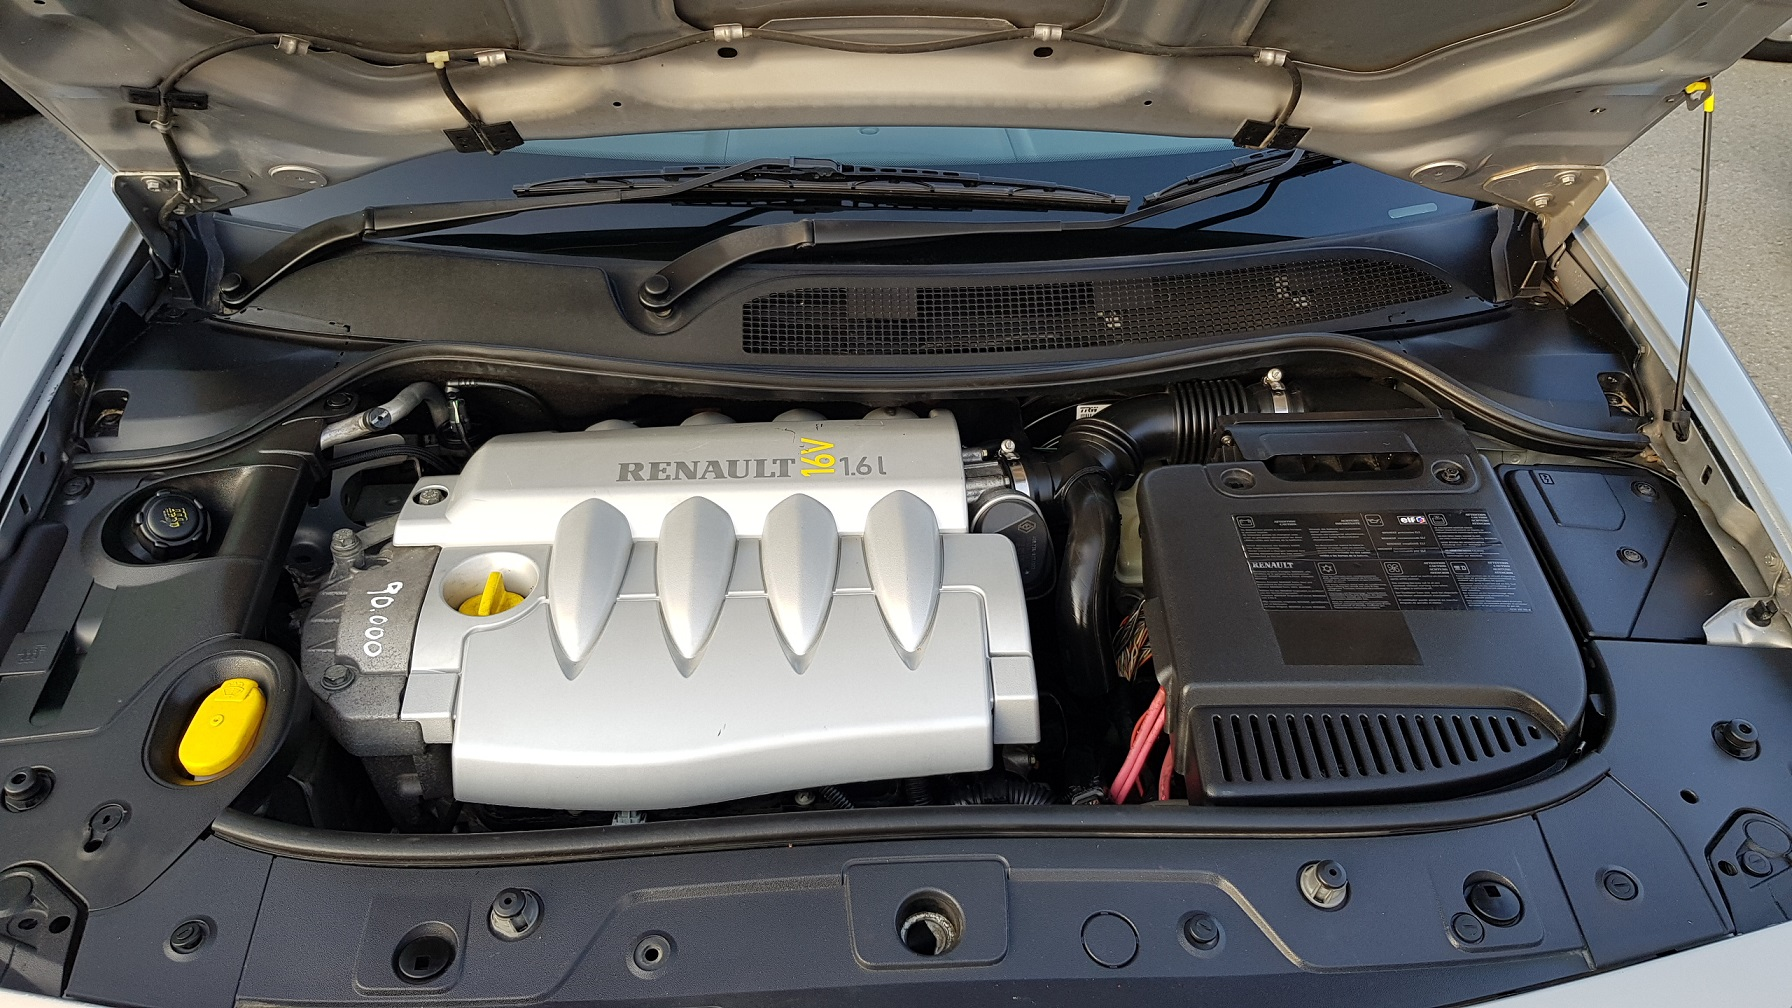 Renault Megane Convertible 16